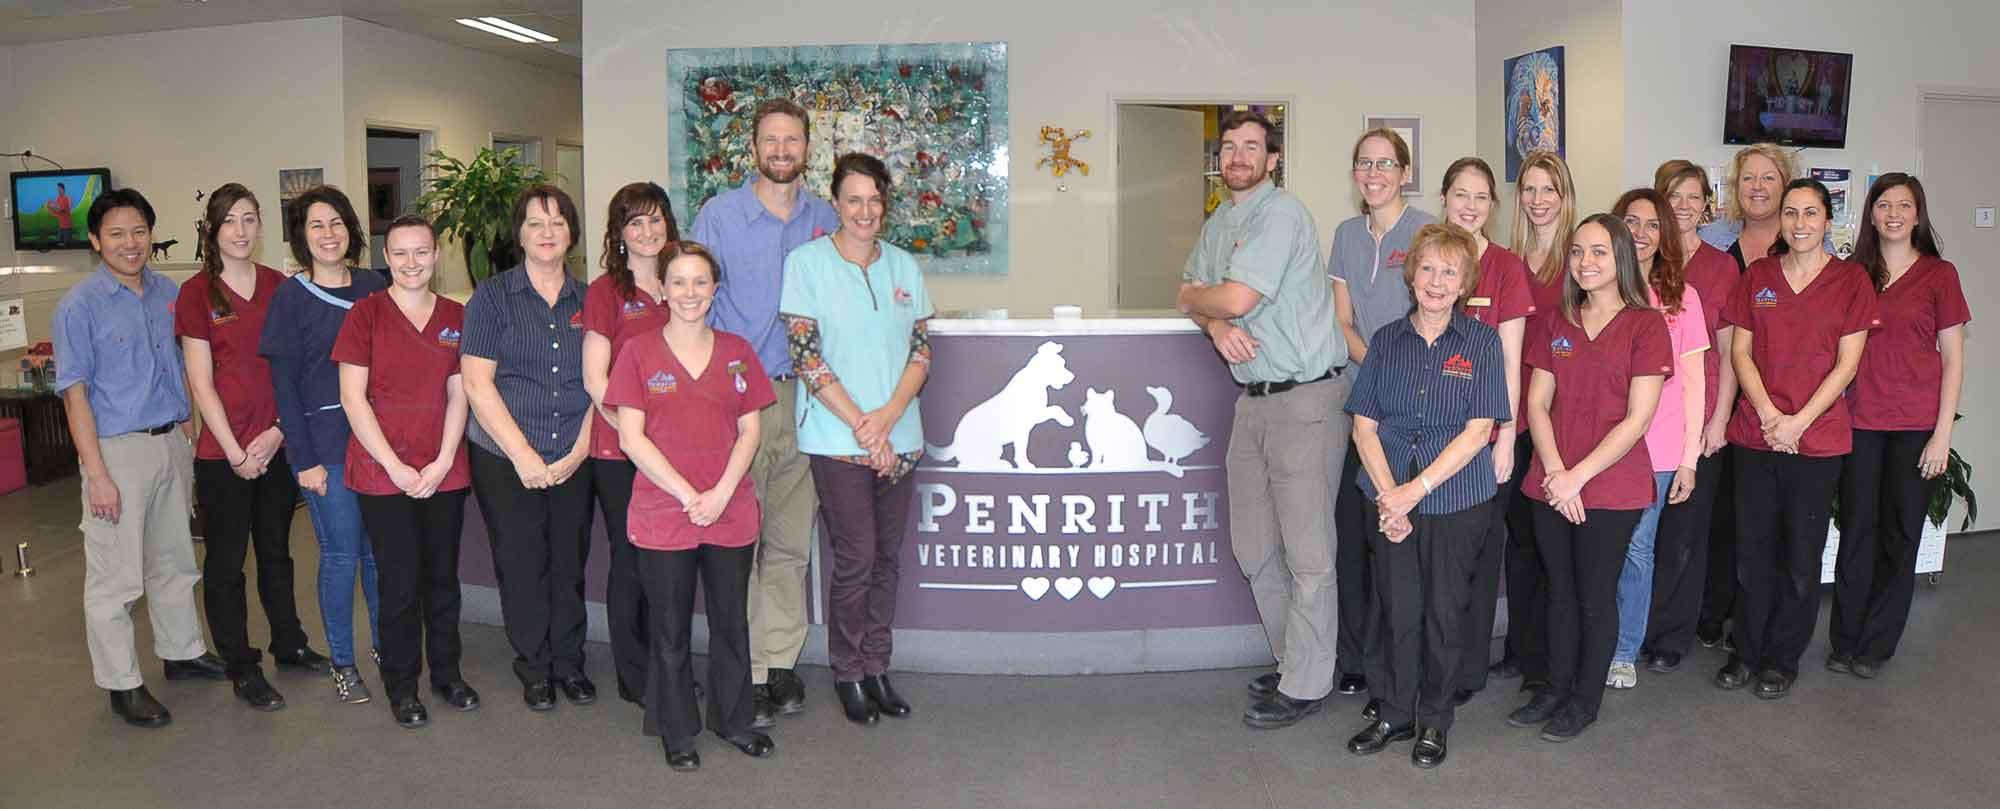 penrith veterinary hospital staff